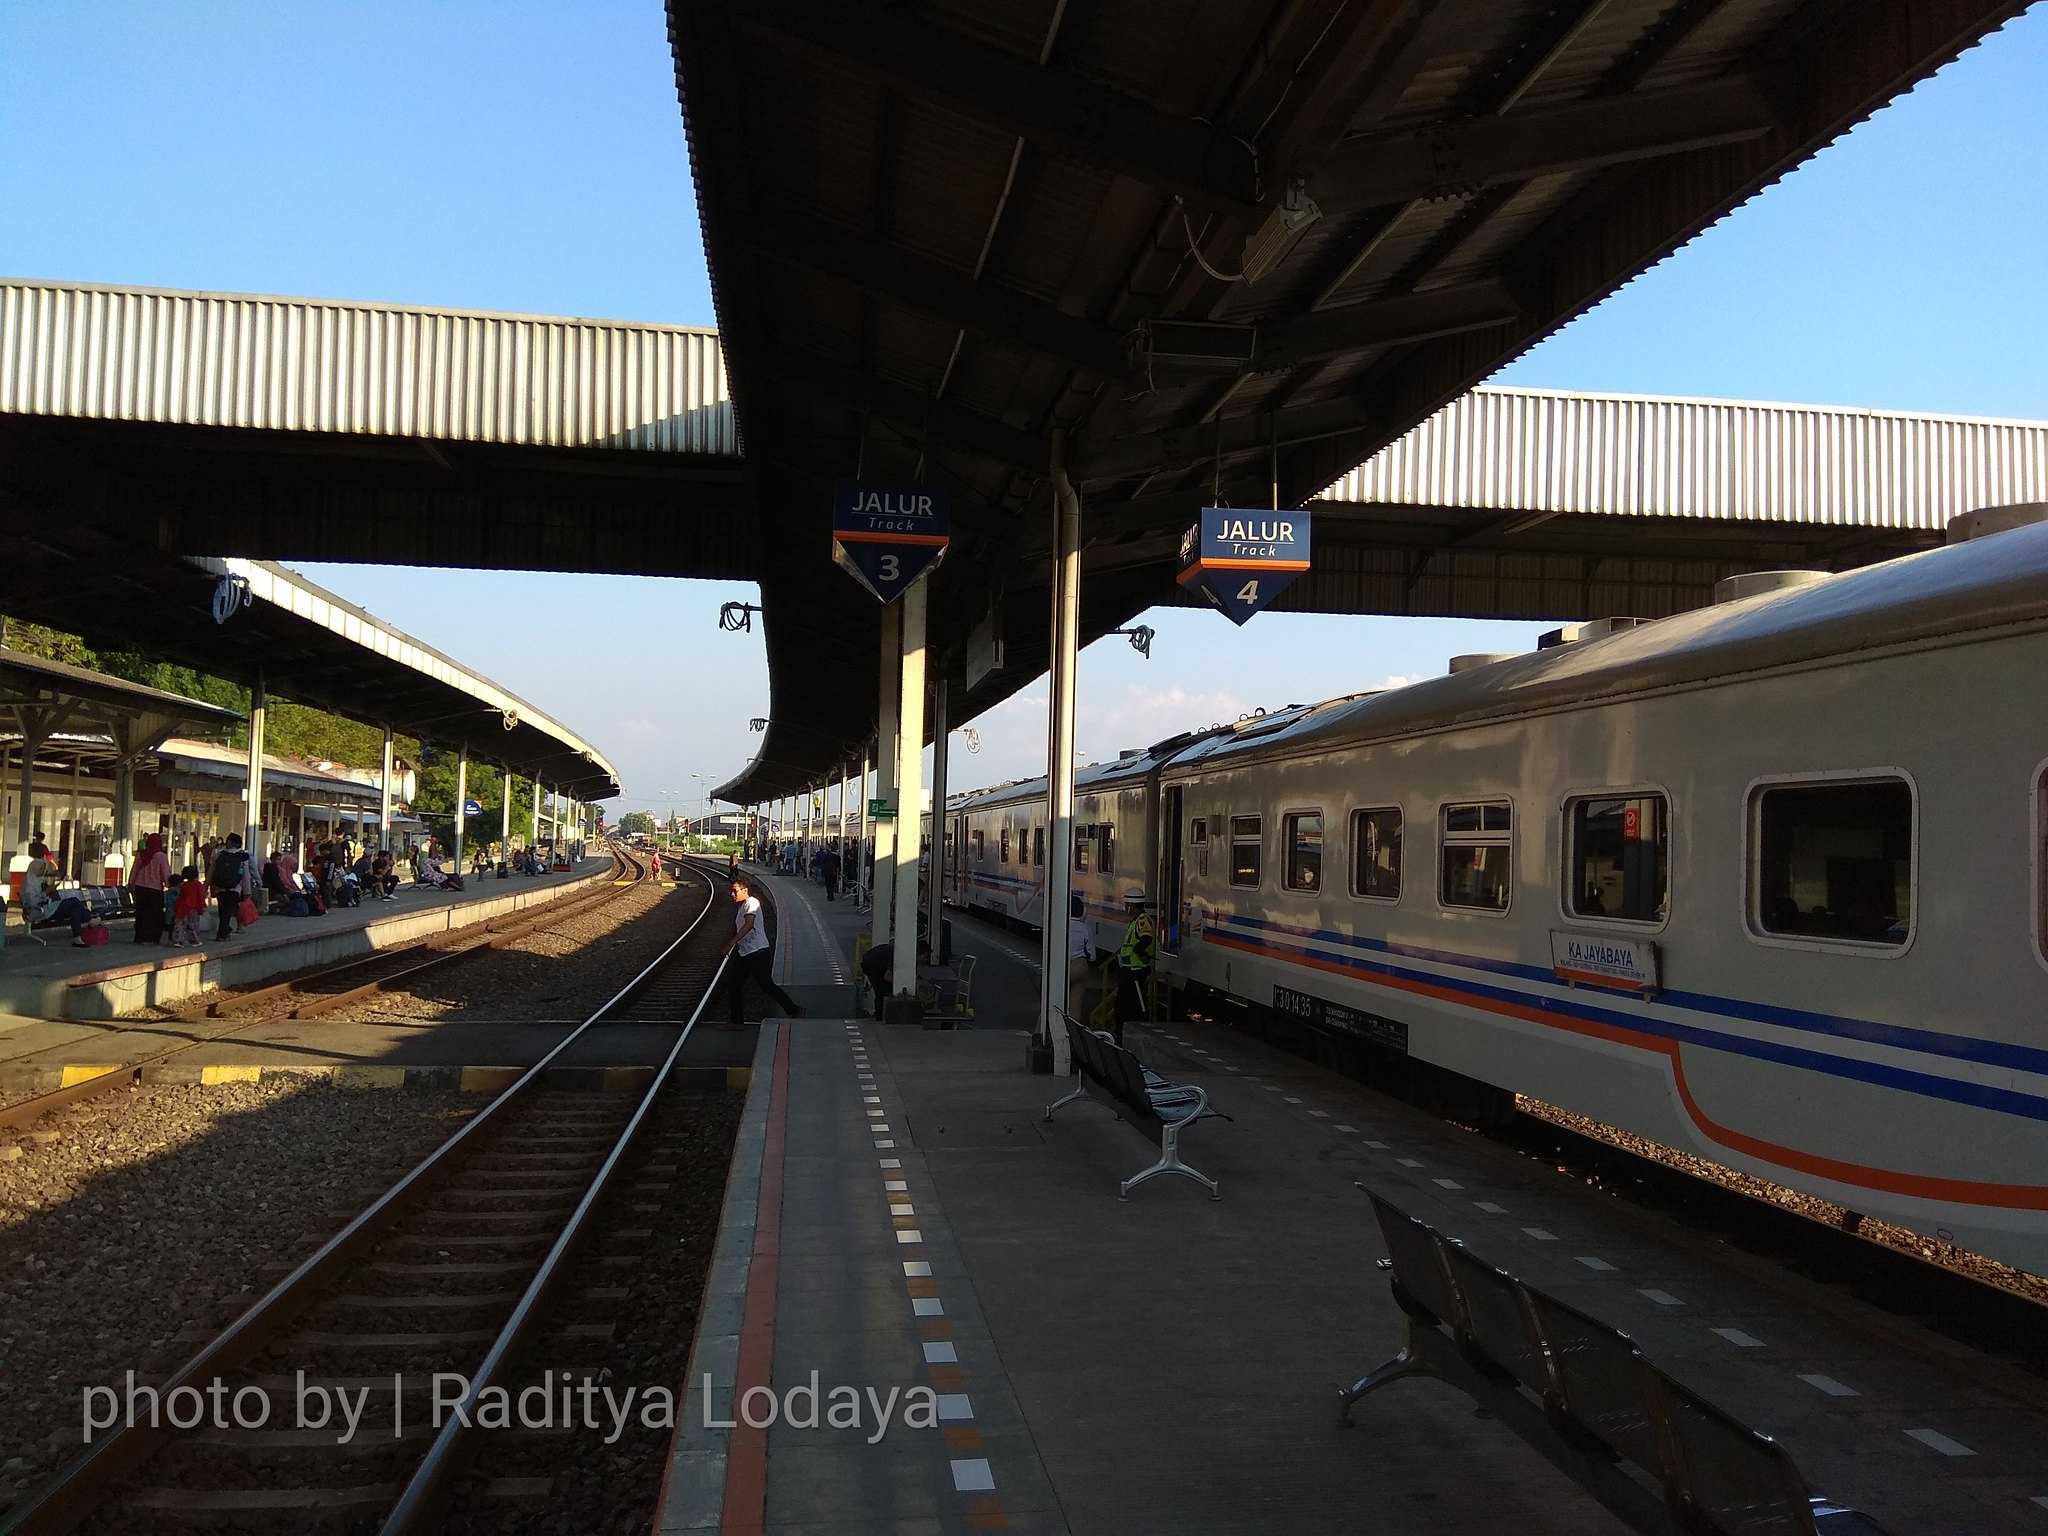 27 TRIP REPORT KERETA API JAYABAYA 1 (JAKARTA-CIREBON) -- STASIUN CIREBON PRUJAKAN 1